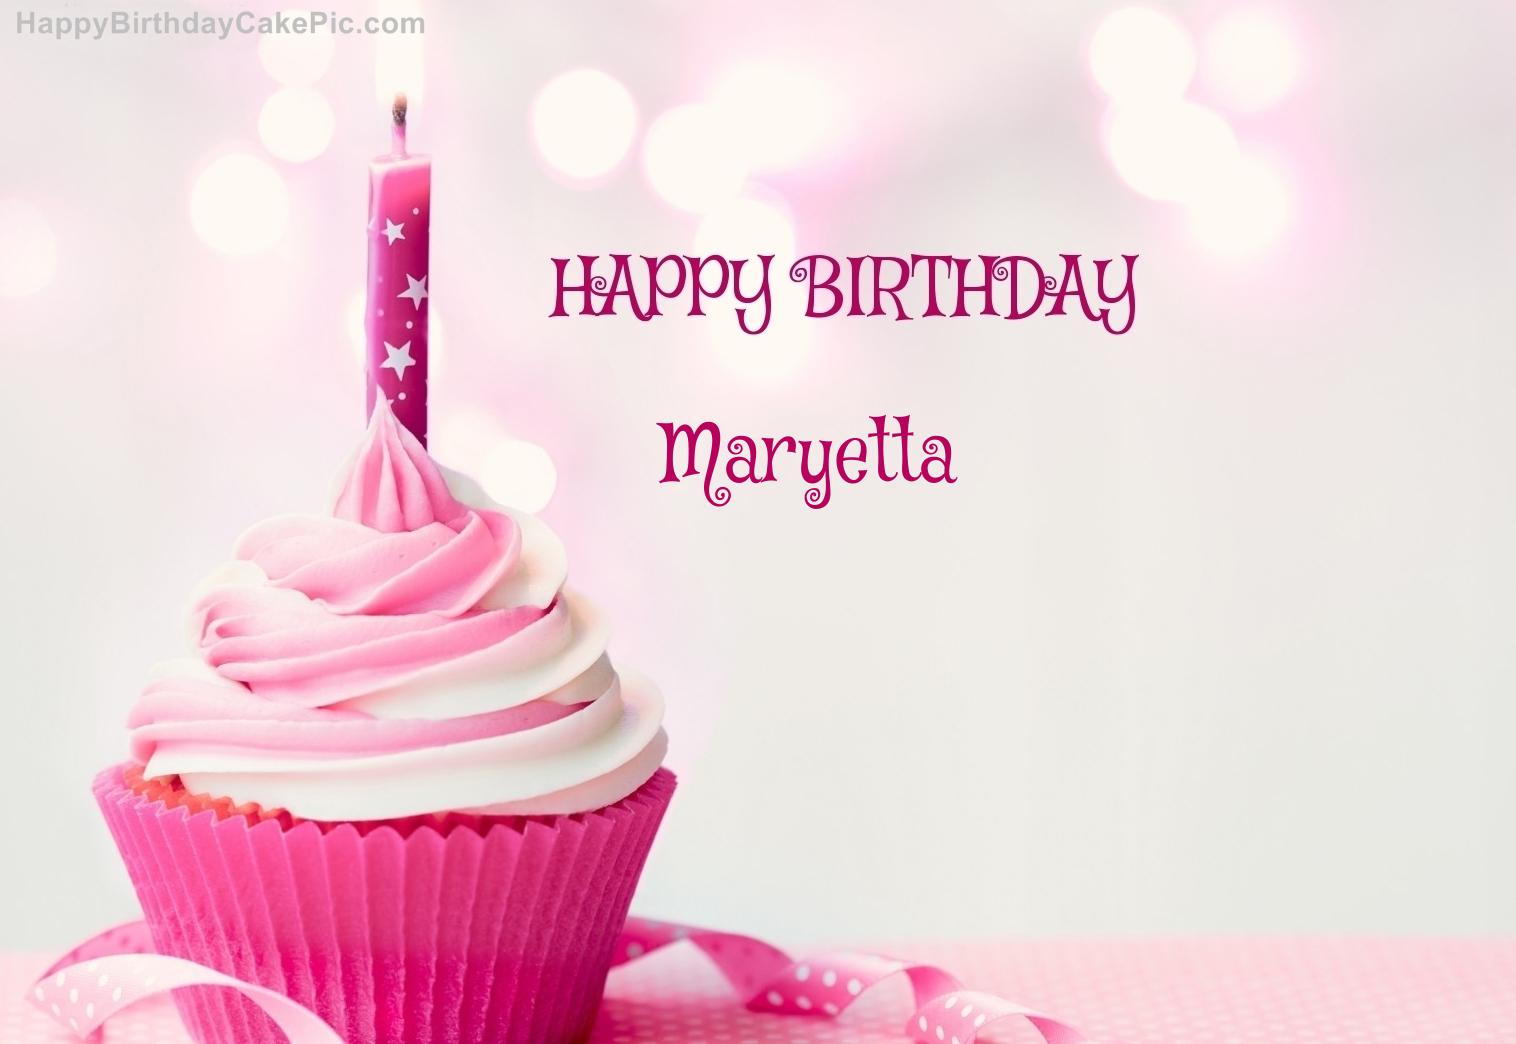 Happy Birthday Cupcake Candle Pink Cake For Maryetta